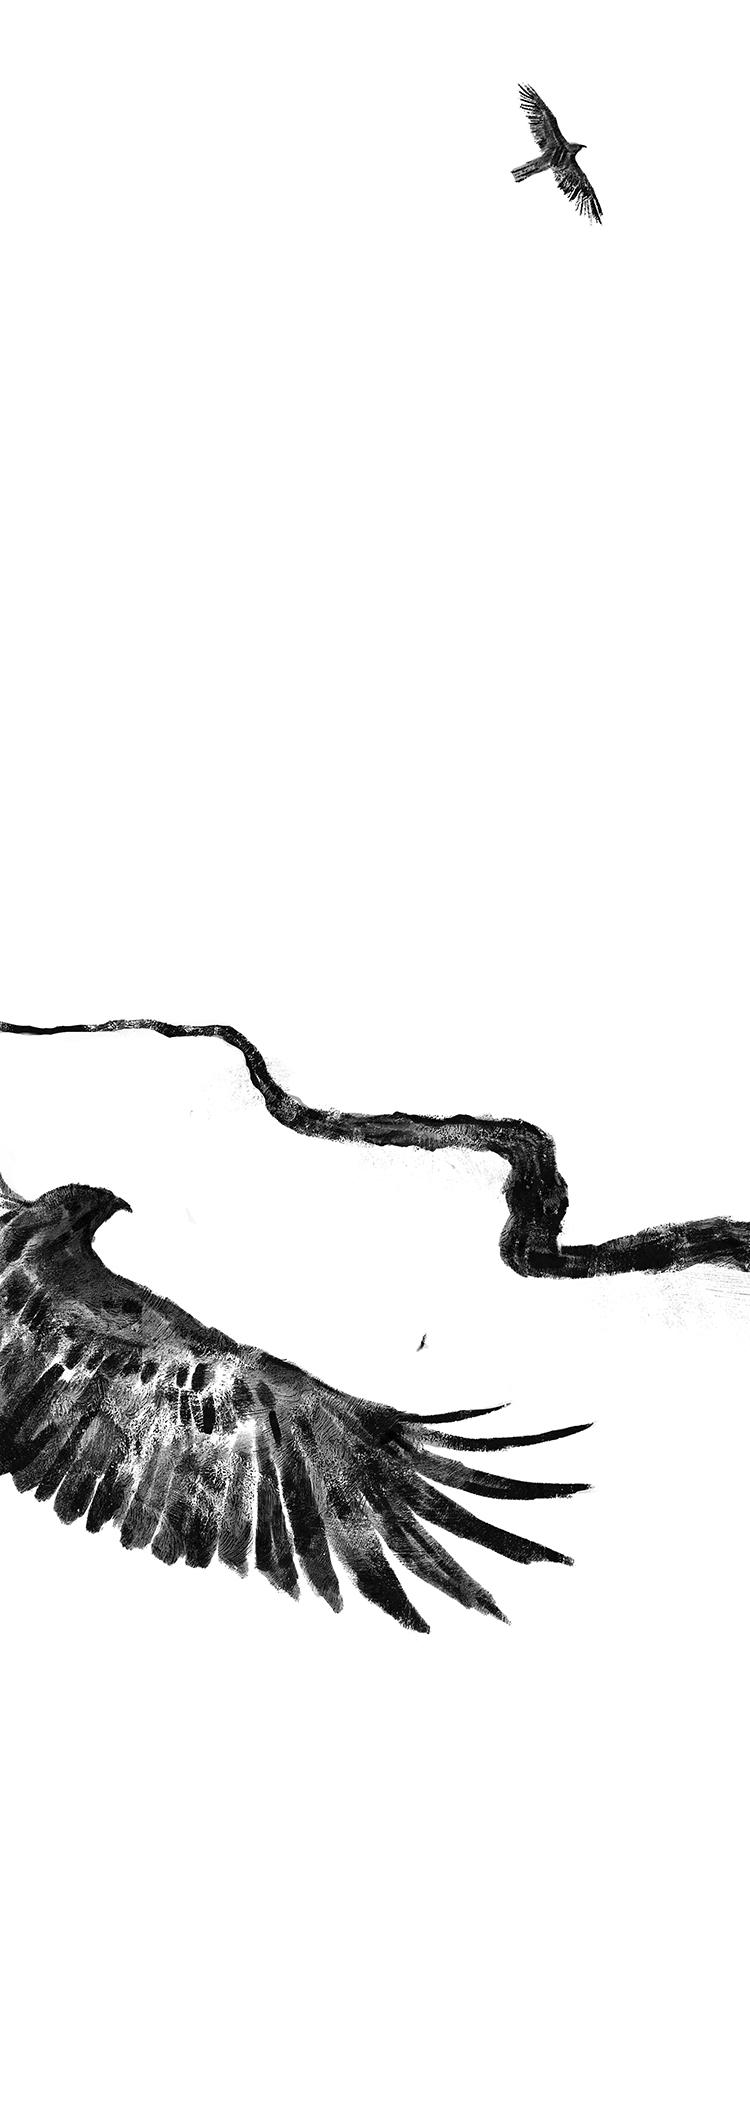 hawk flying above